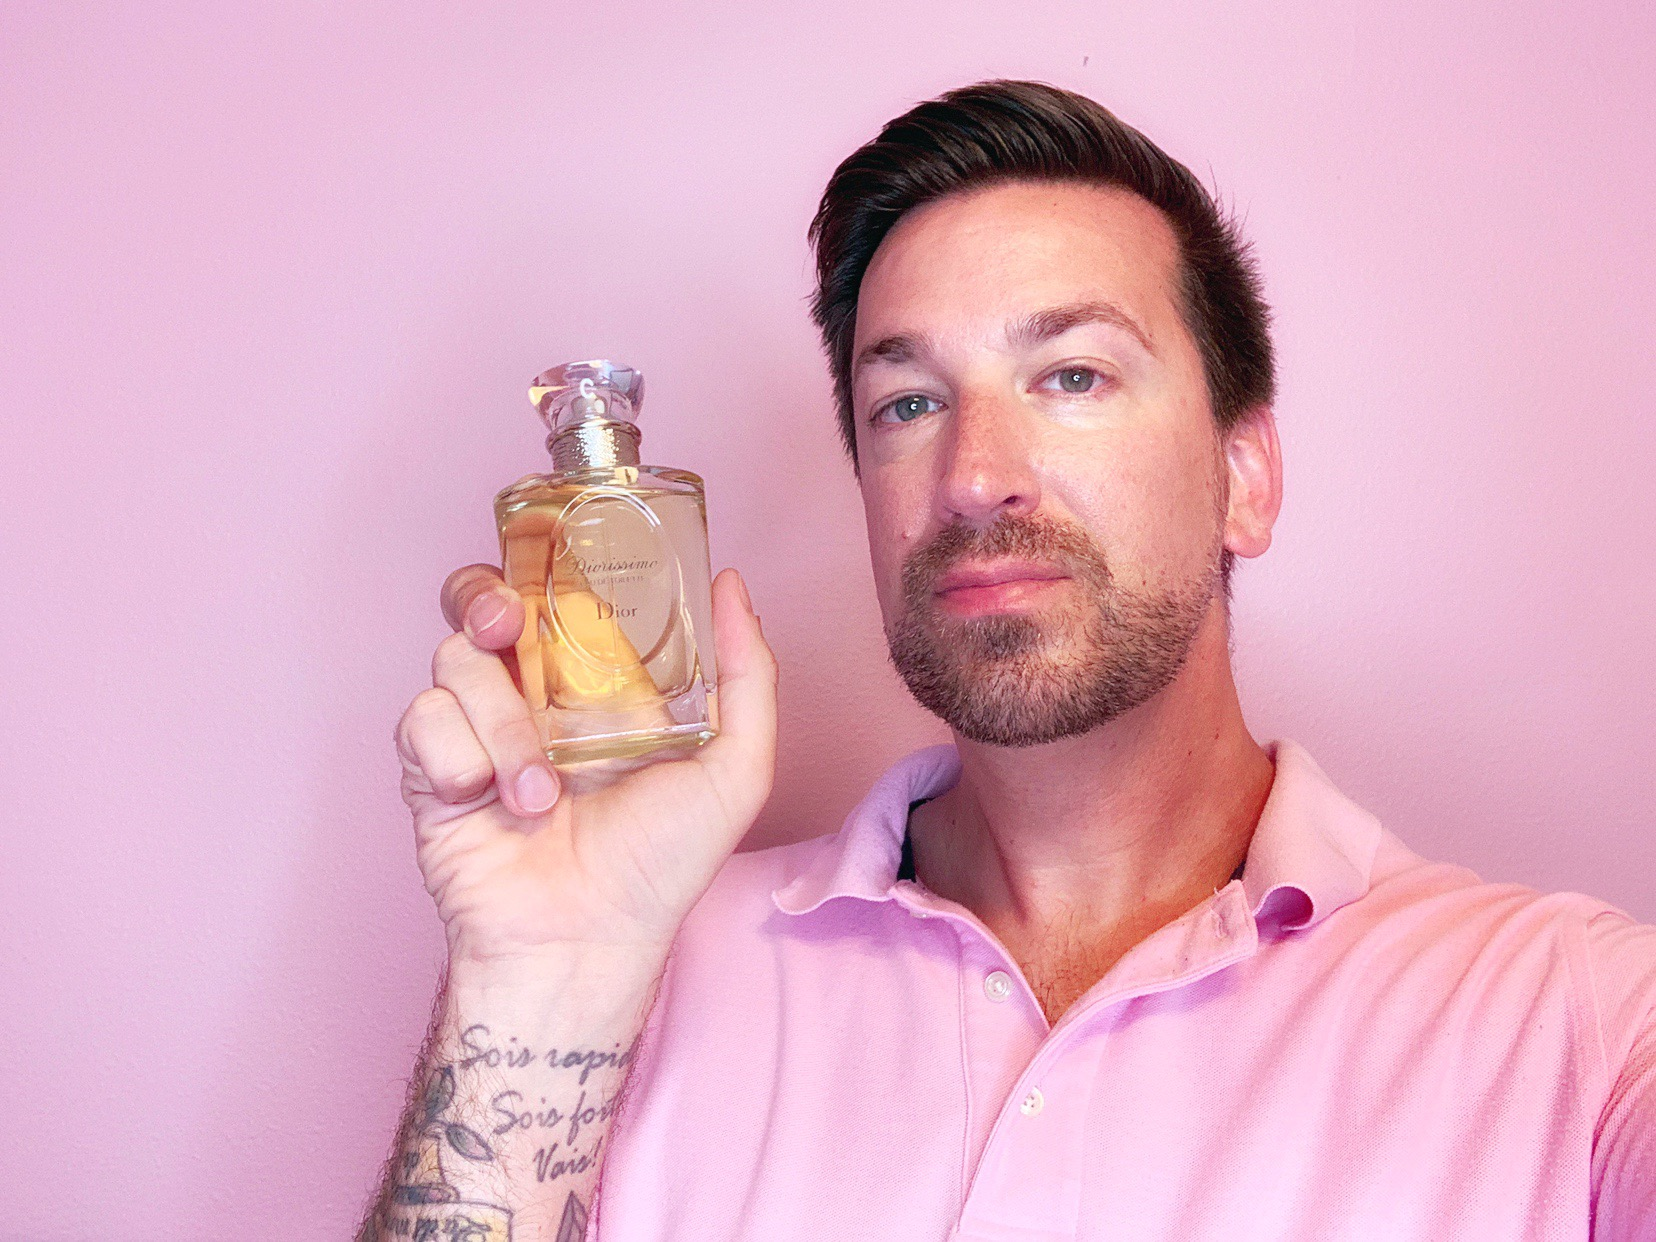 Christian dior, Christian dior perfume, Christian dior fragrance, Christian dior diorissmo,